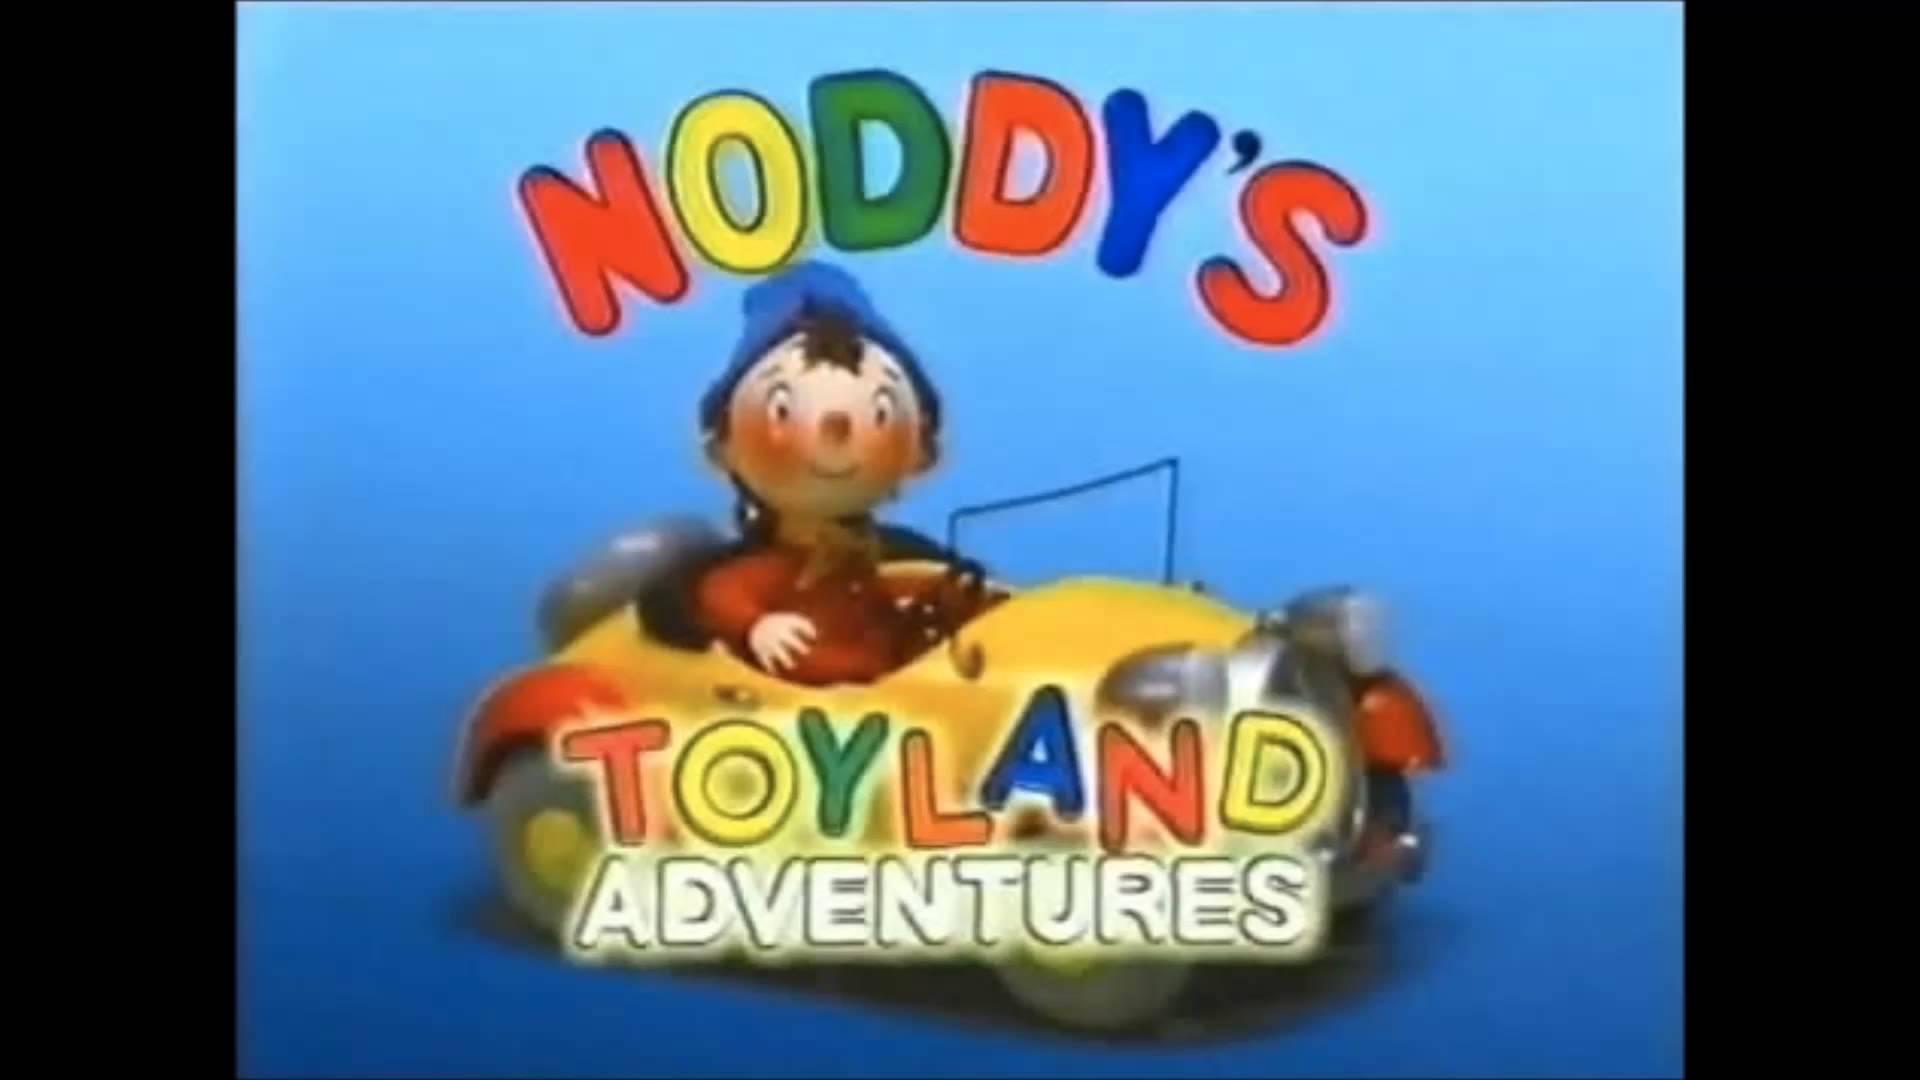 Noddys Toyland Adventures Theme Song  Movie Theme Songs